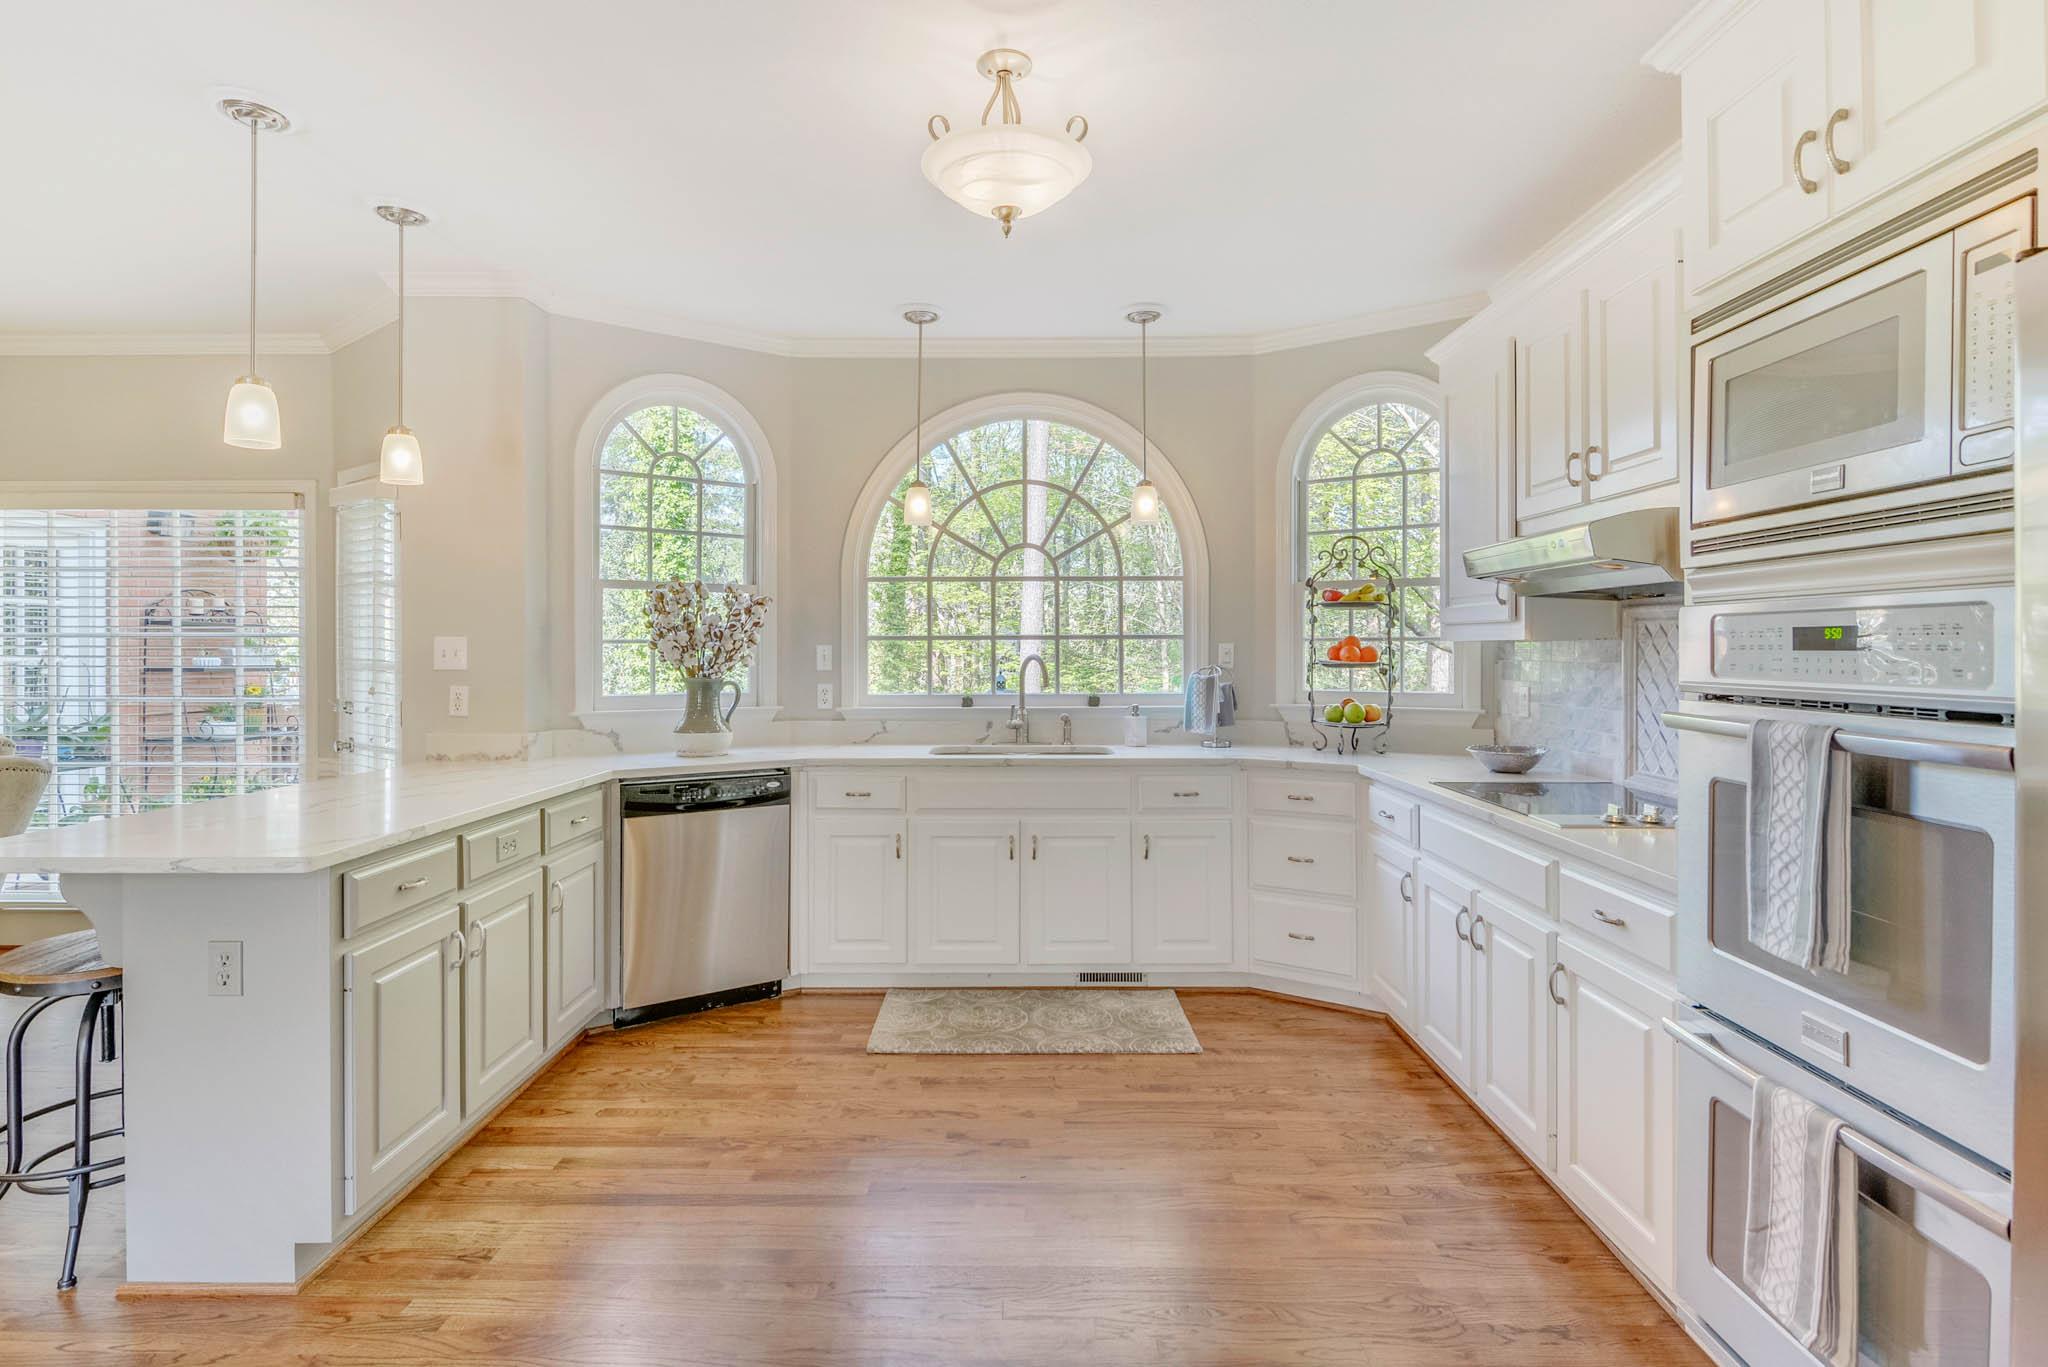 real_estate_photographer_kitchen_photography-5.jpg